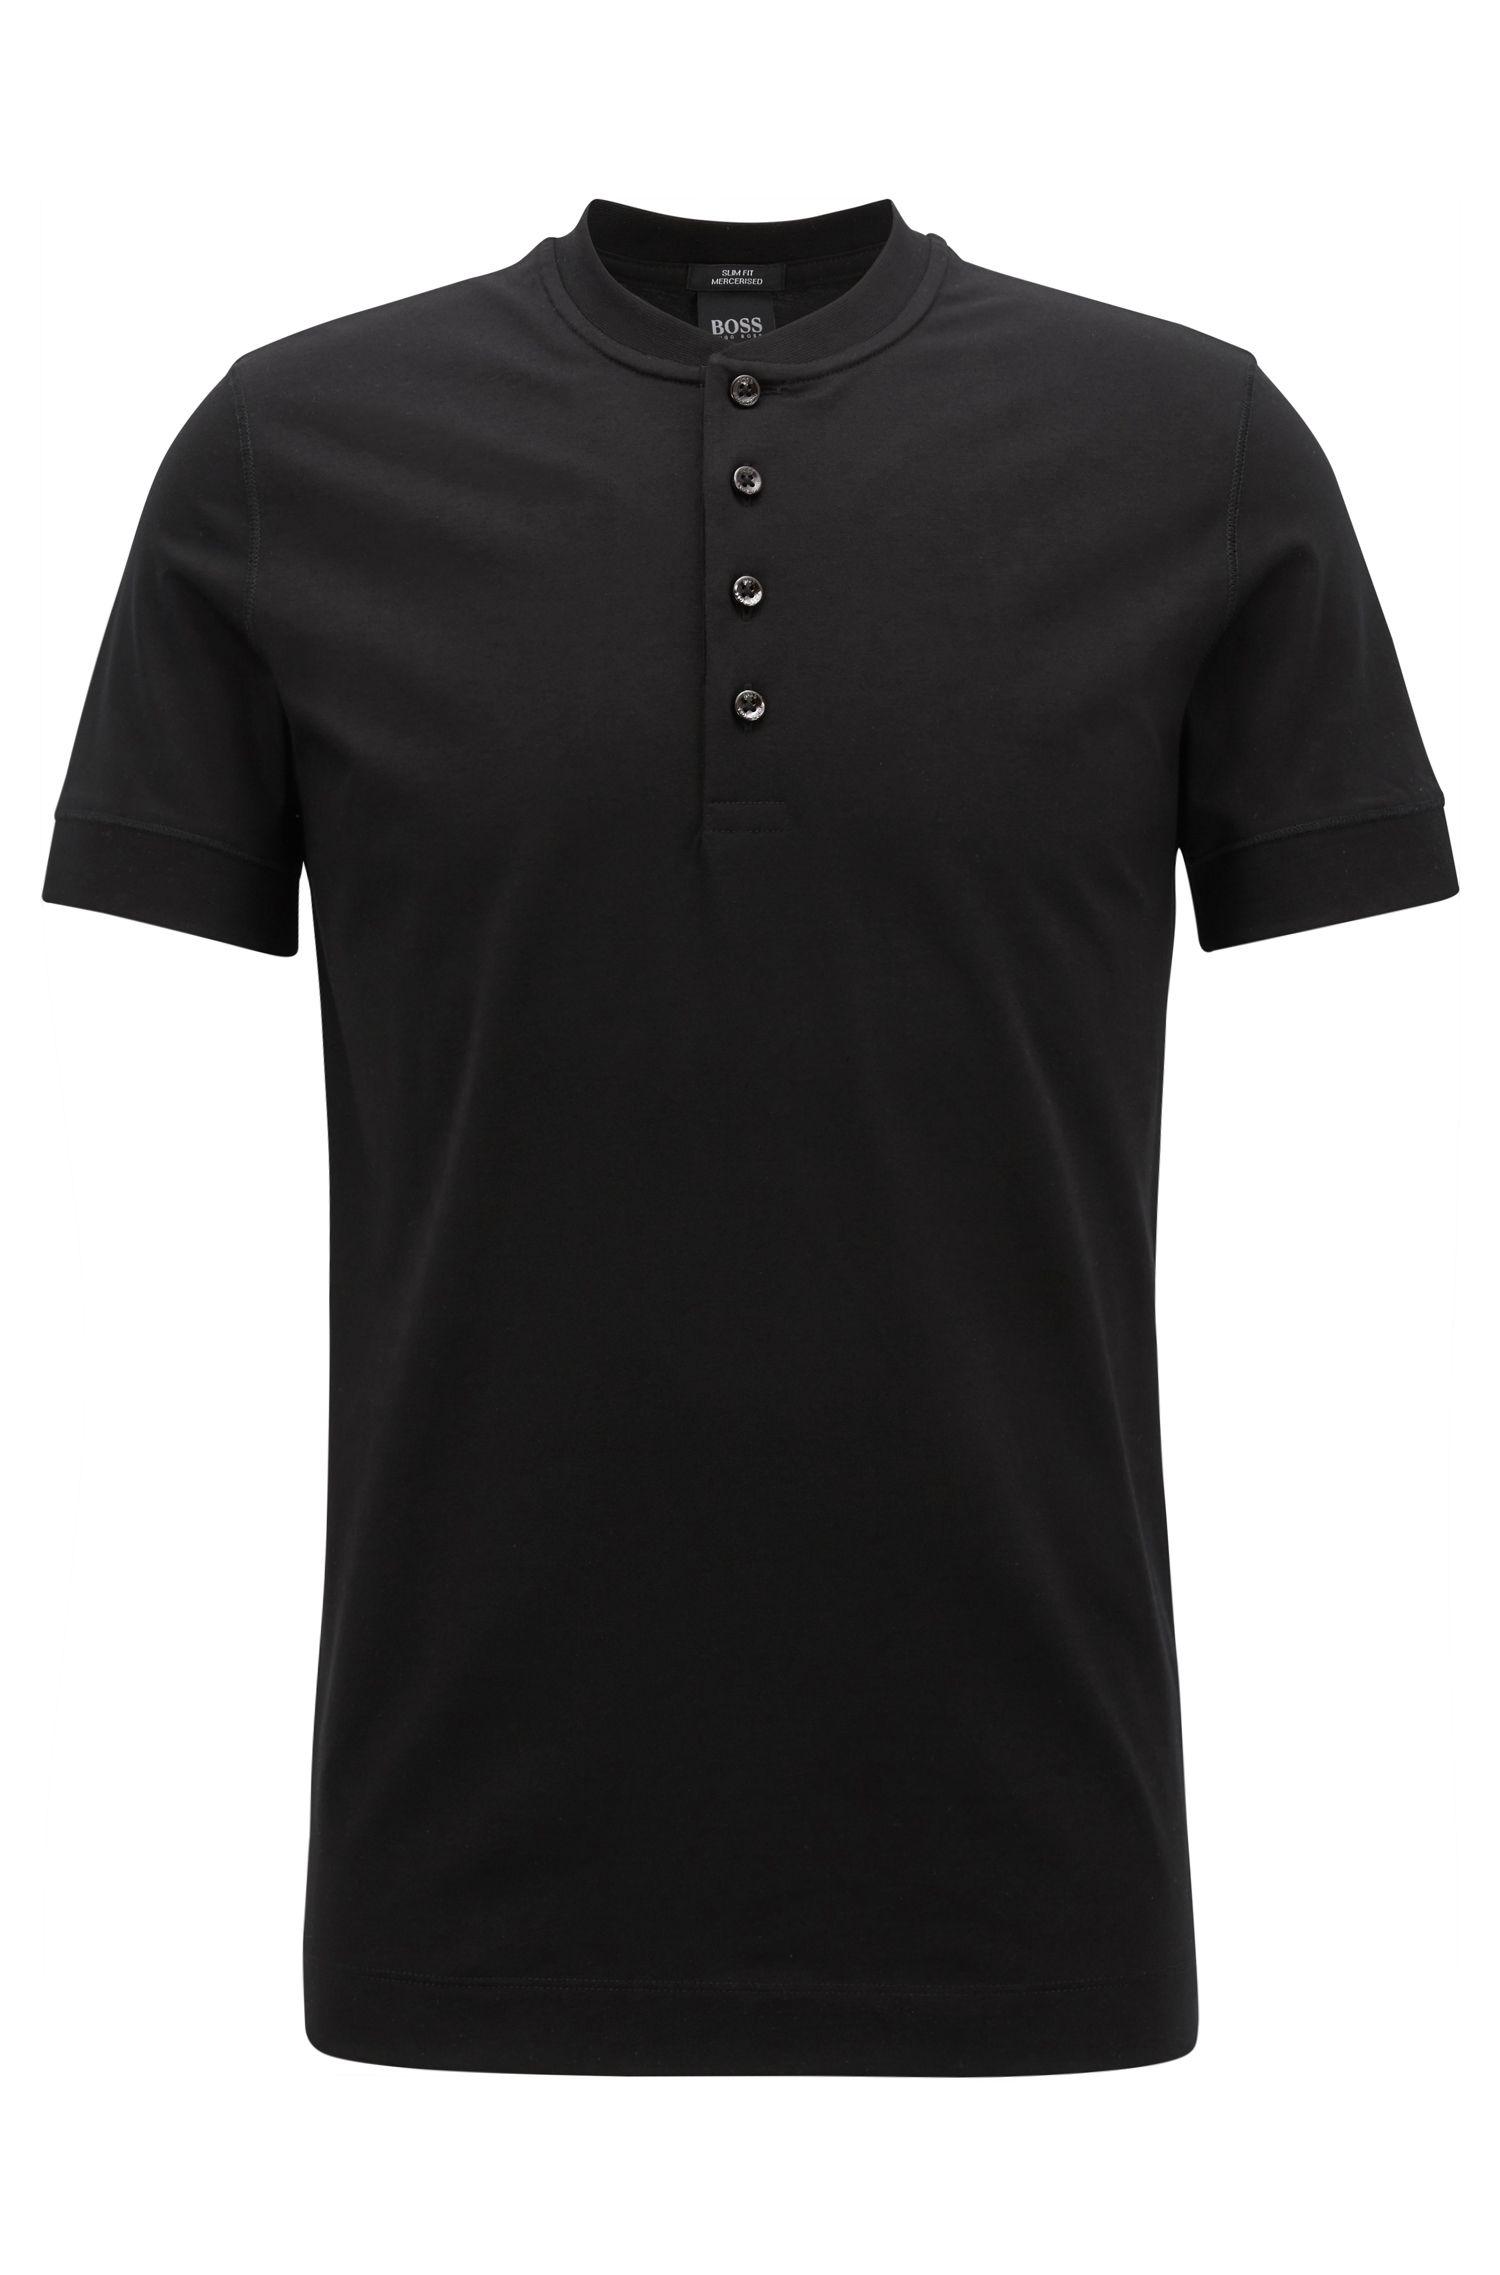 T-shirt stile Henley slim fit in jersey mercerizzato